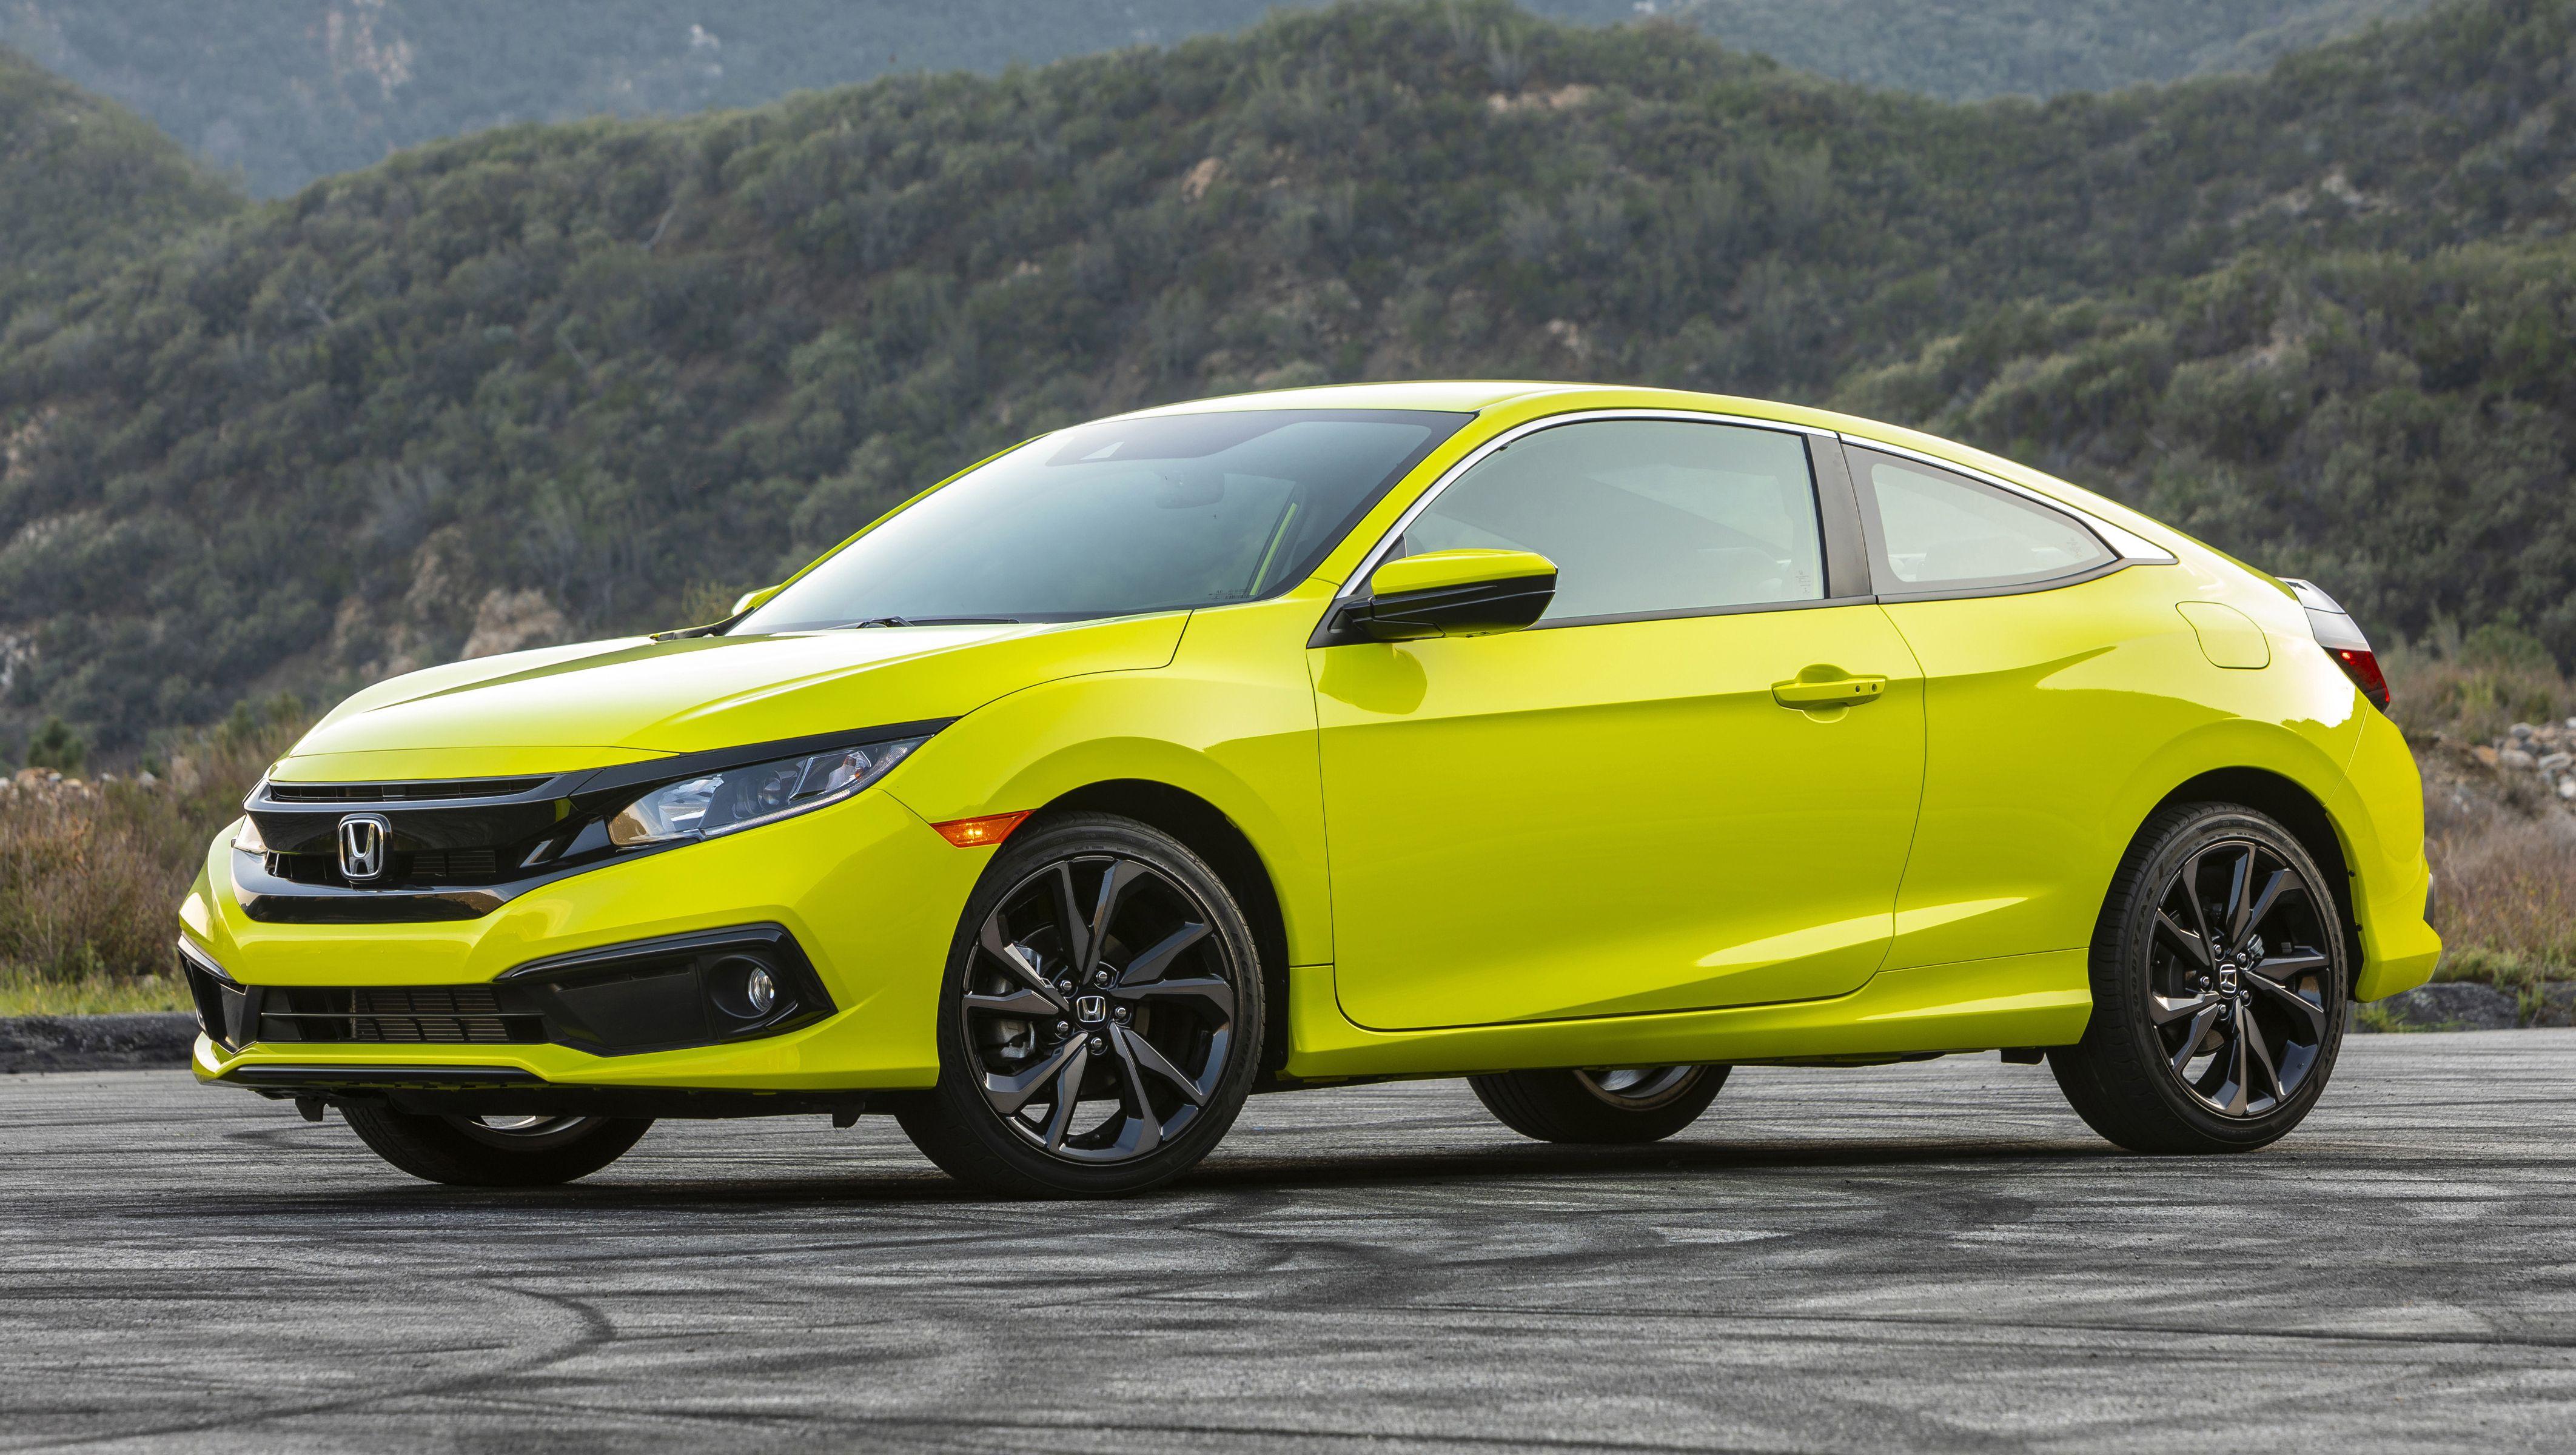 If You Want A New Honda Civic Coupe You Need To Move Quick Top Speed Honda Civic Coupe Civic Coupe Honda Civic